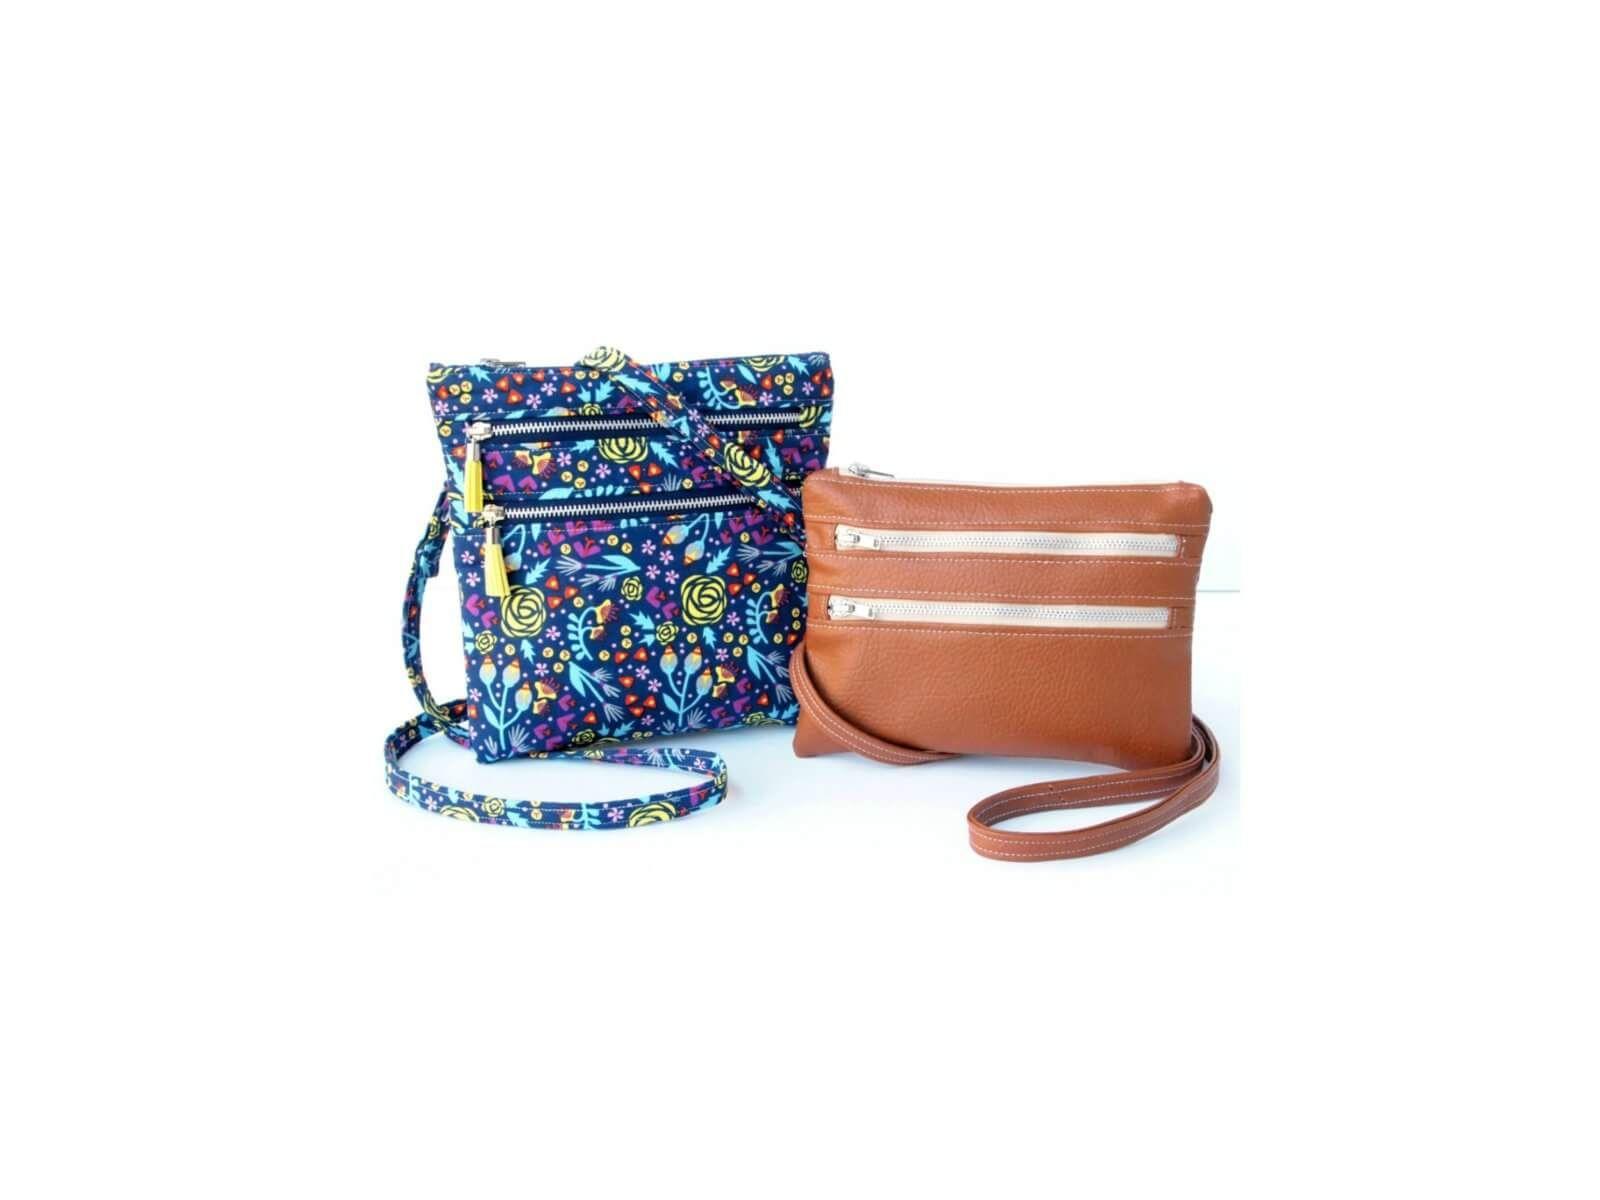 Zippy Crossbody Bags Instant Download   Sew   Pinterest